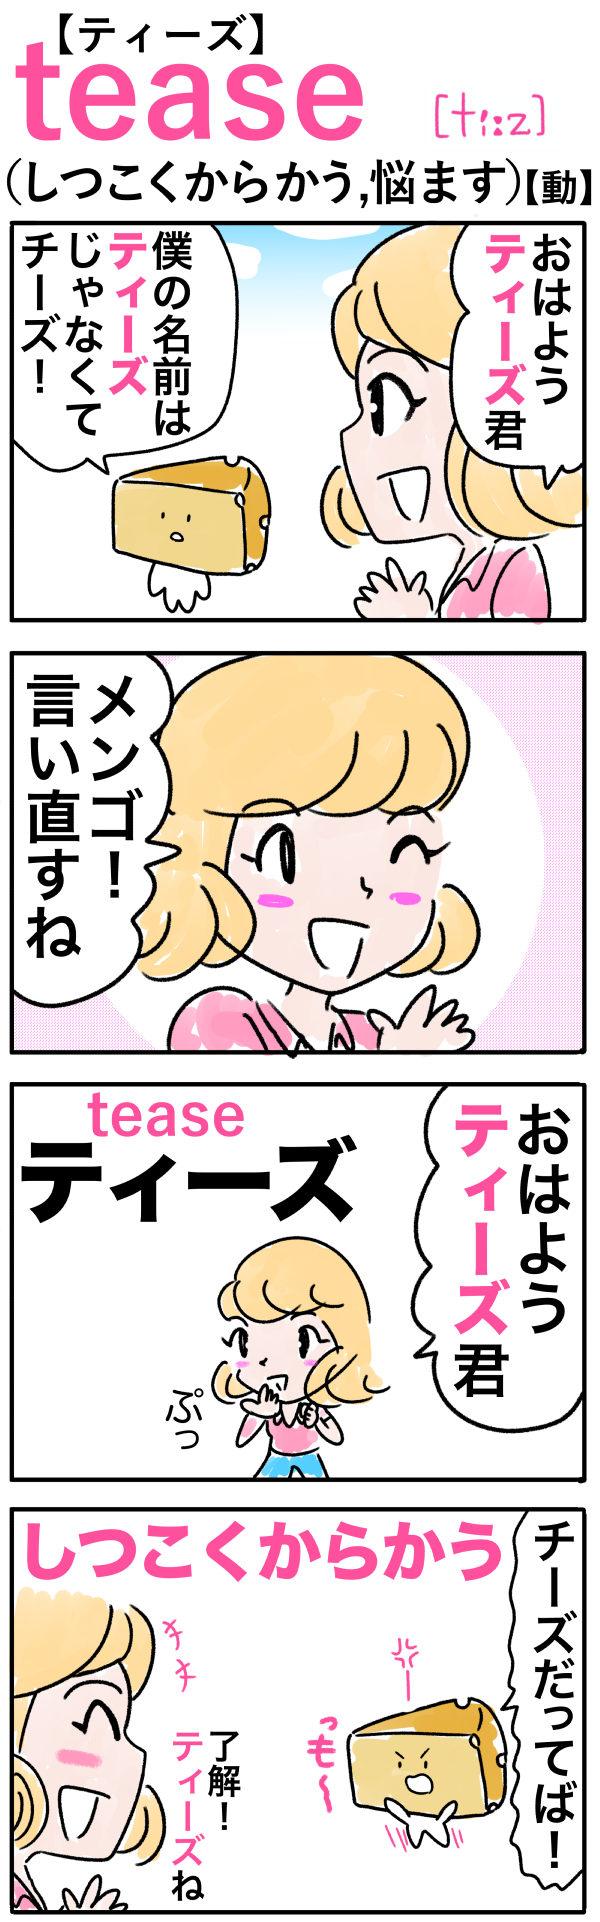 tease(しつこくからかう)の語呂合わせ英単語